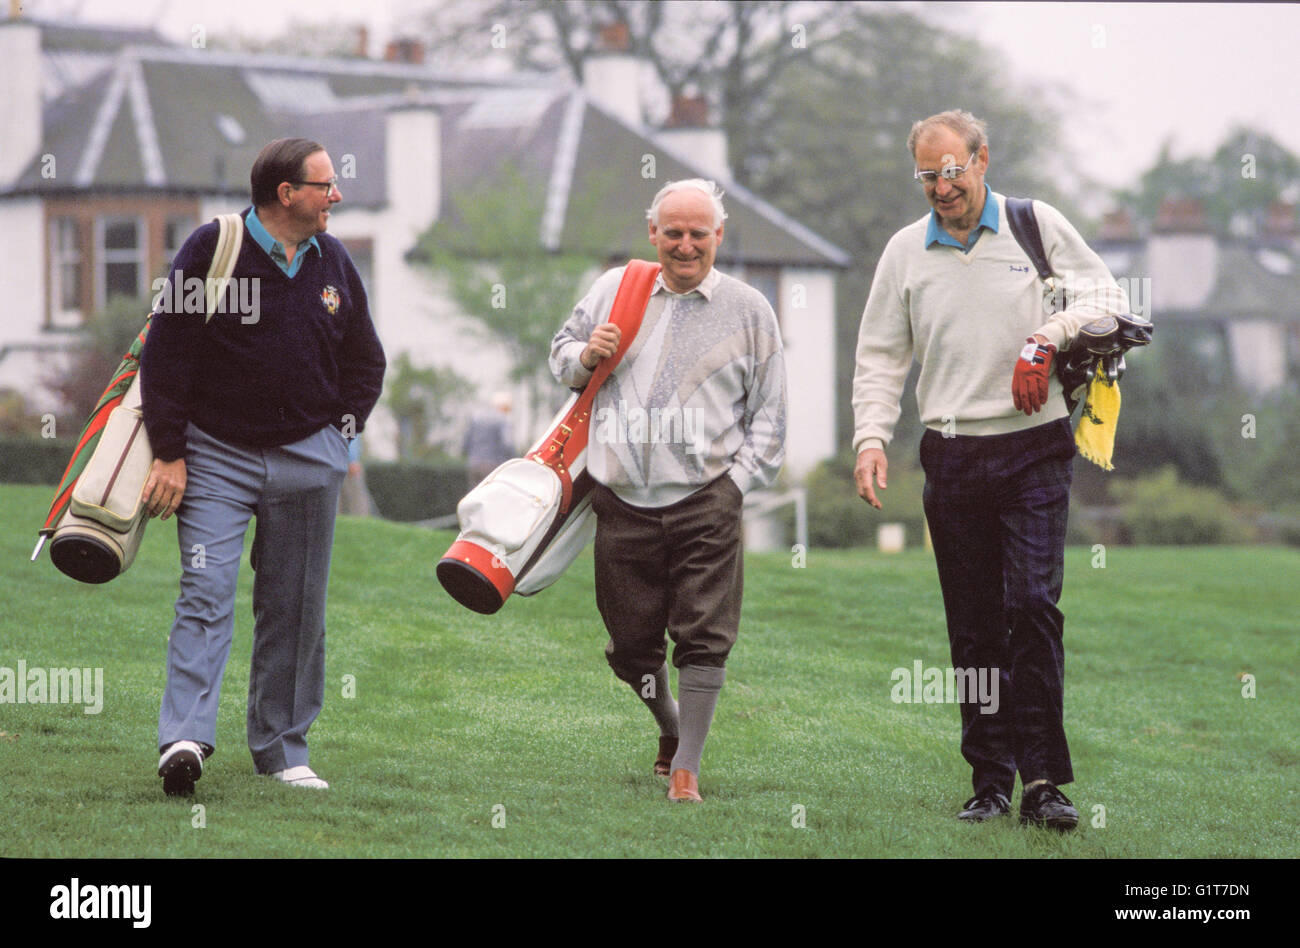 Pensioners playing Golf near Edinburgh Scotland - Stock Image